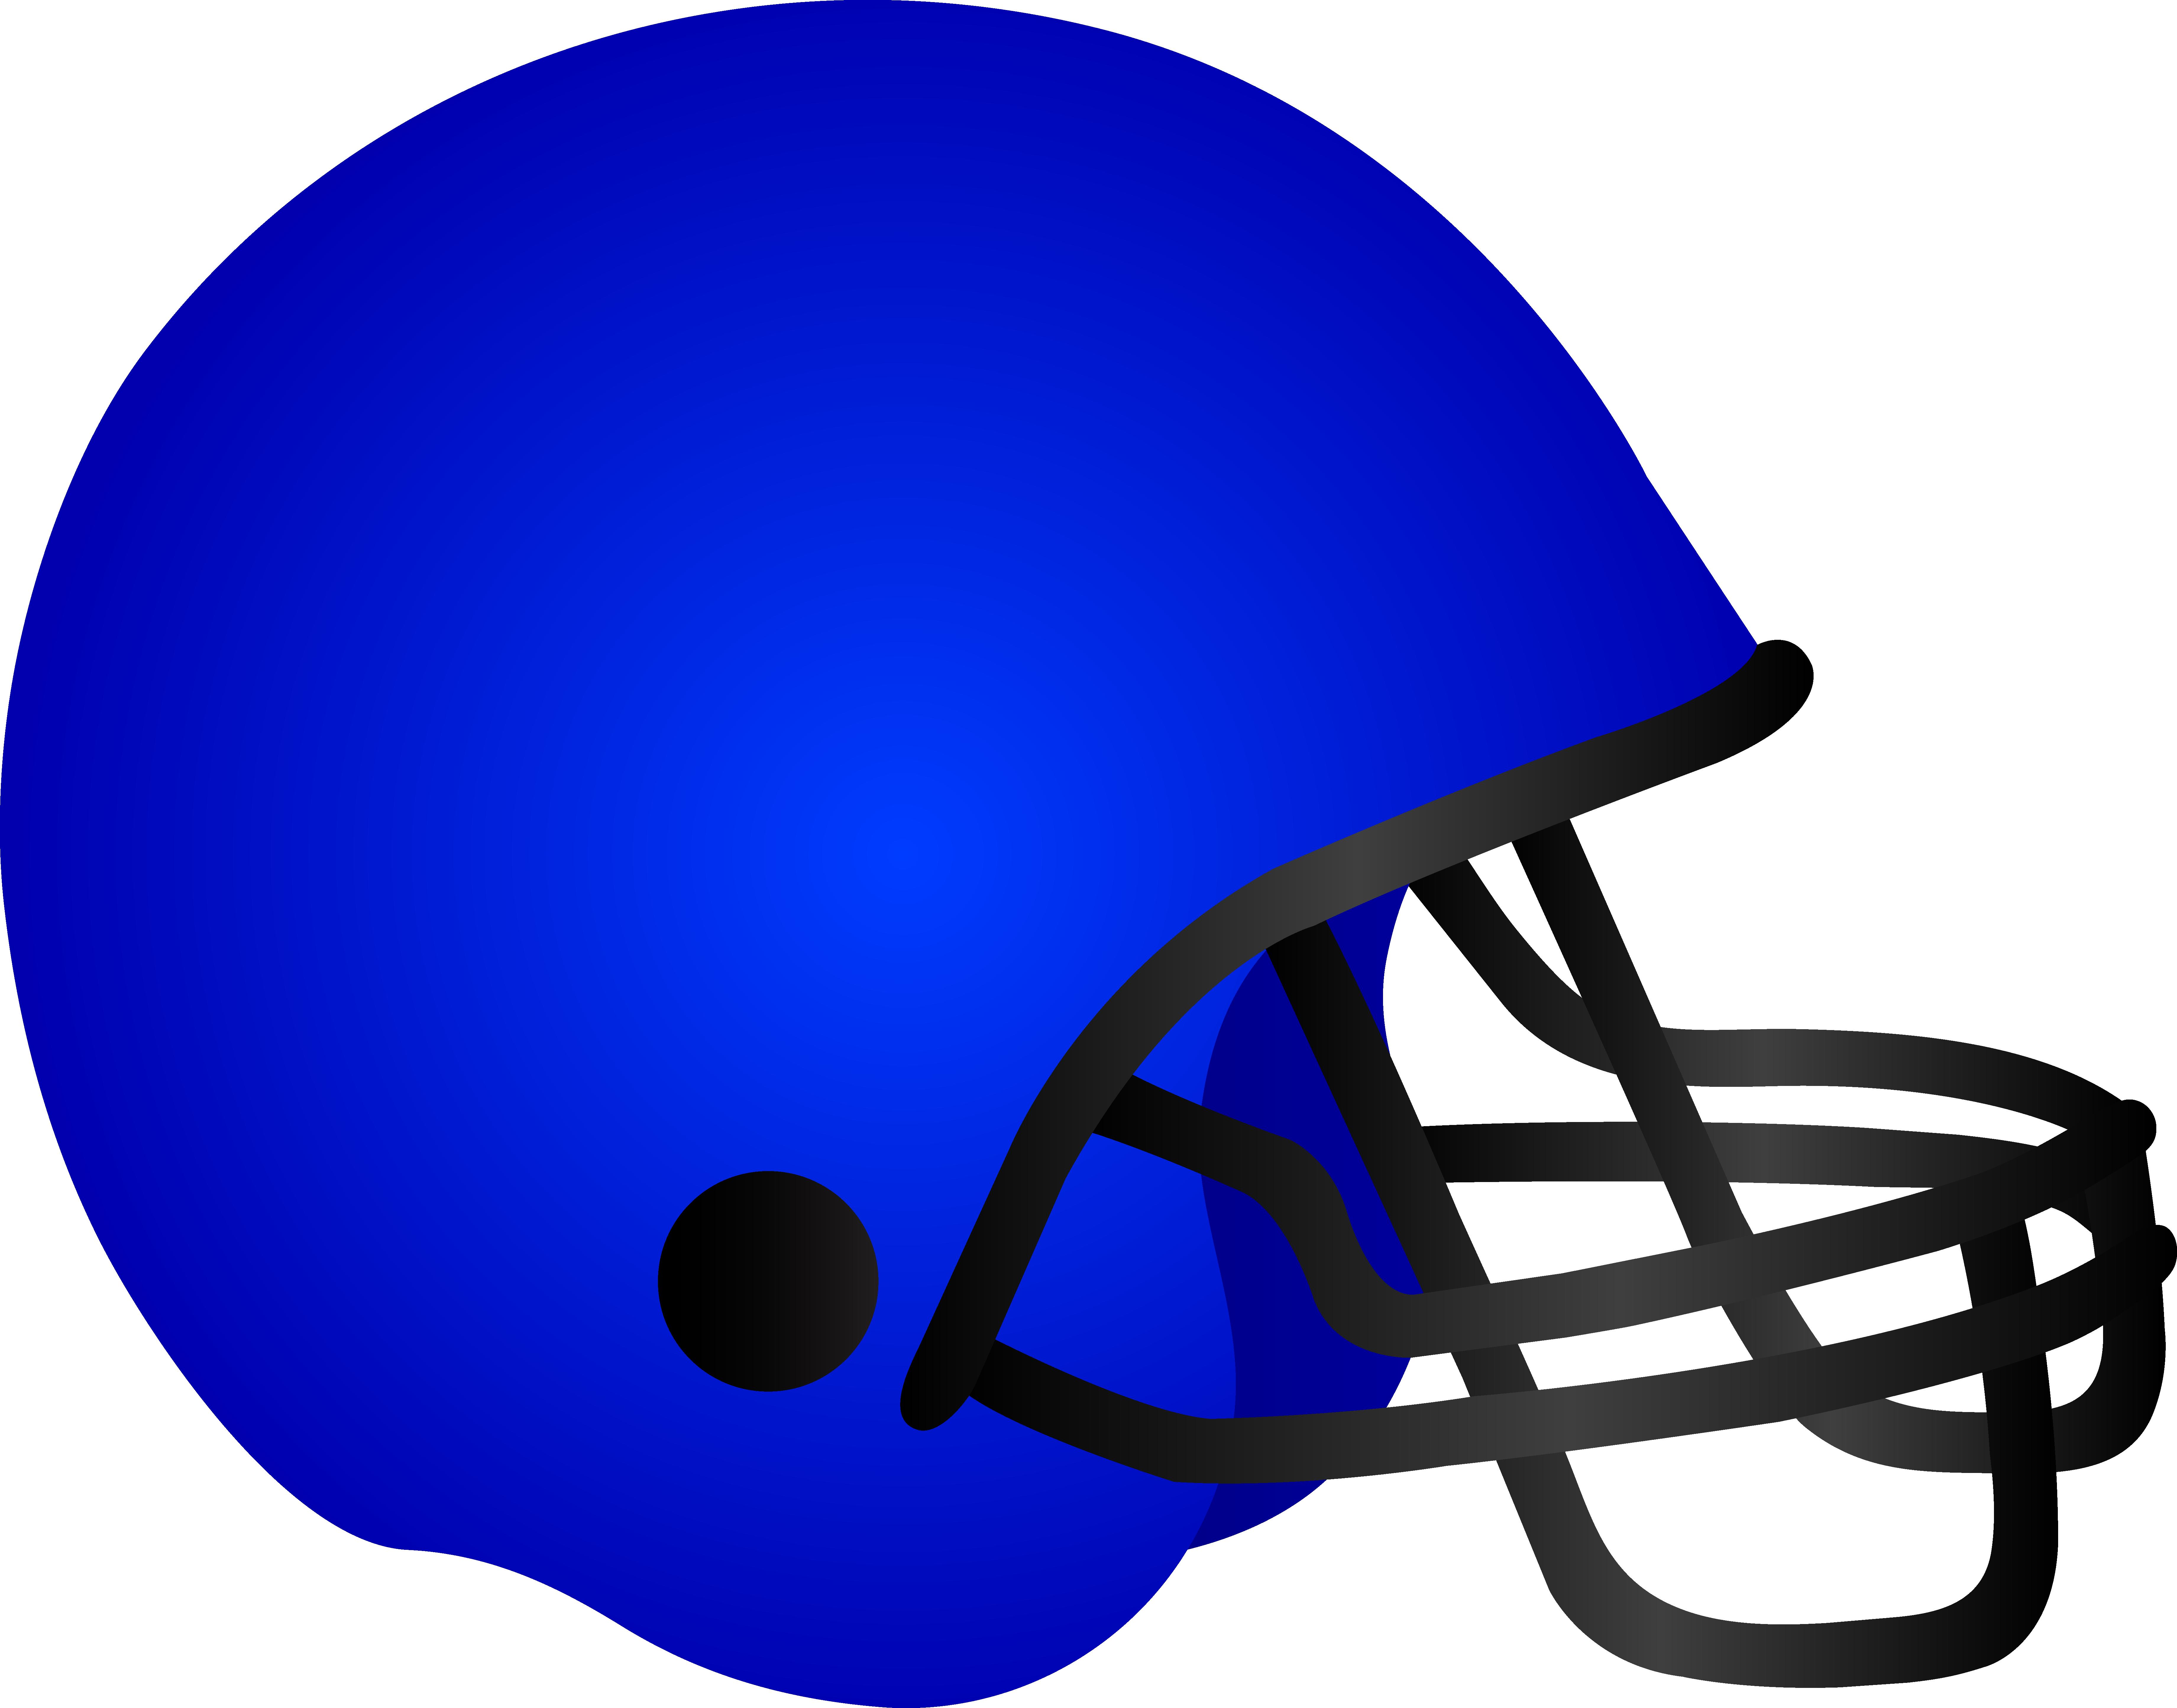 Black Football Helmet Clipart | Clipart Panda - Free Clipart Images